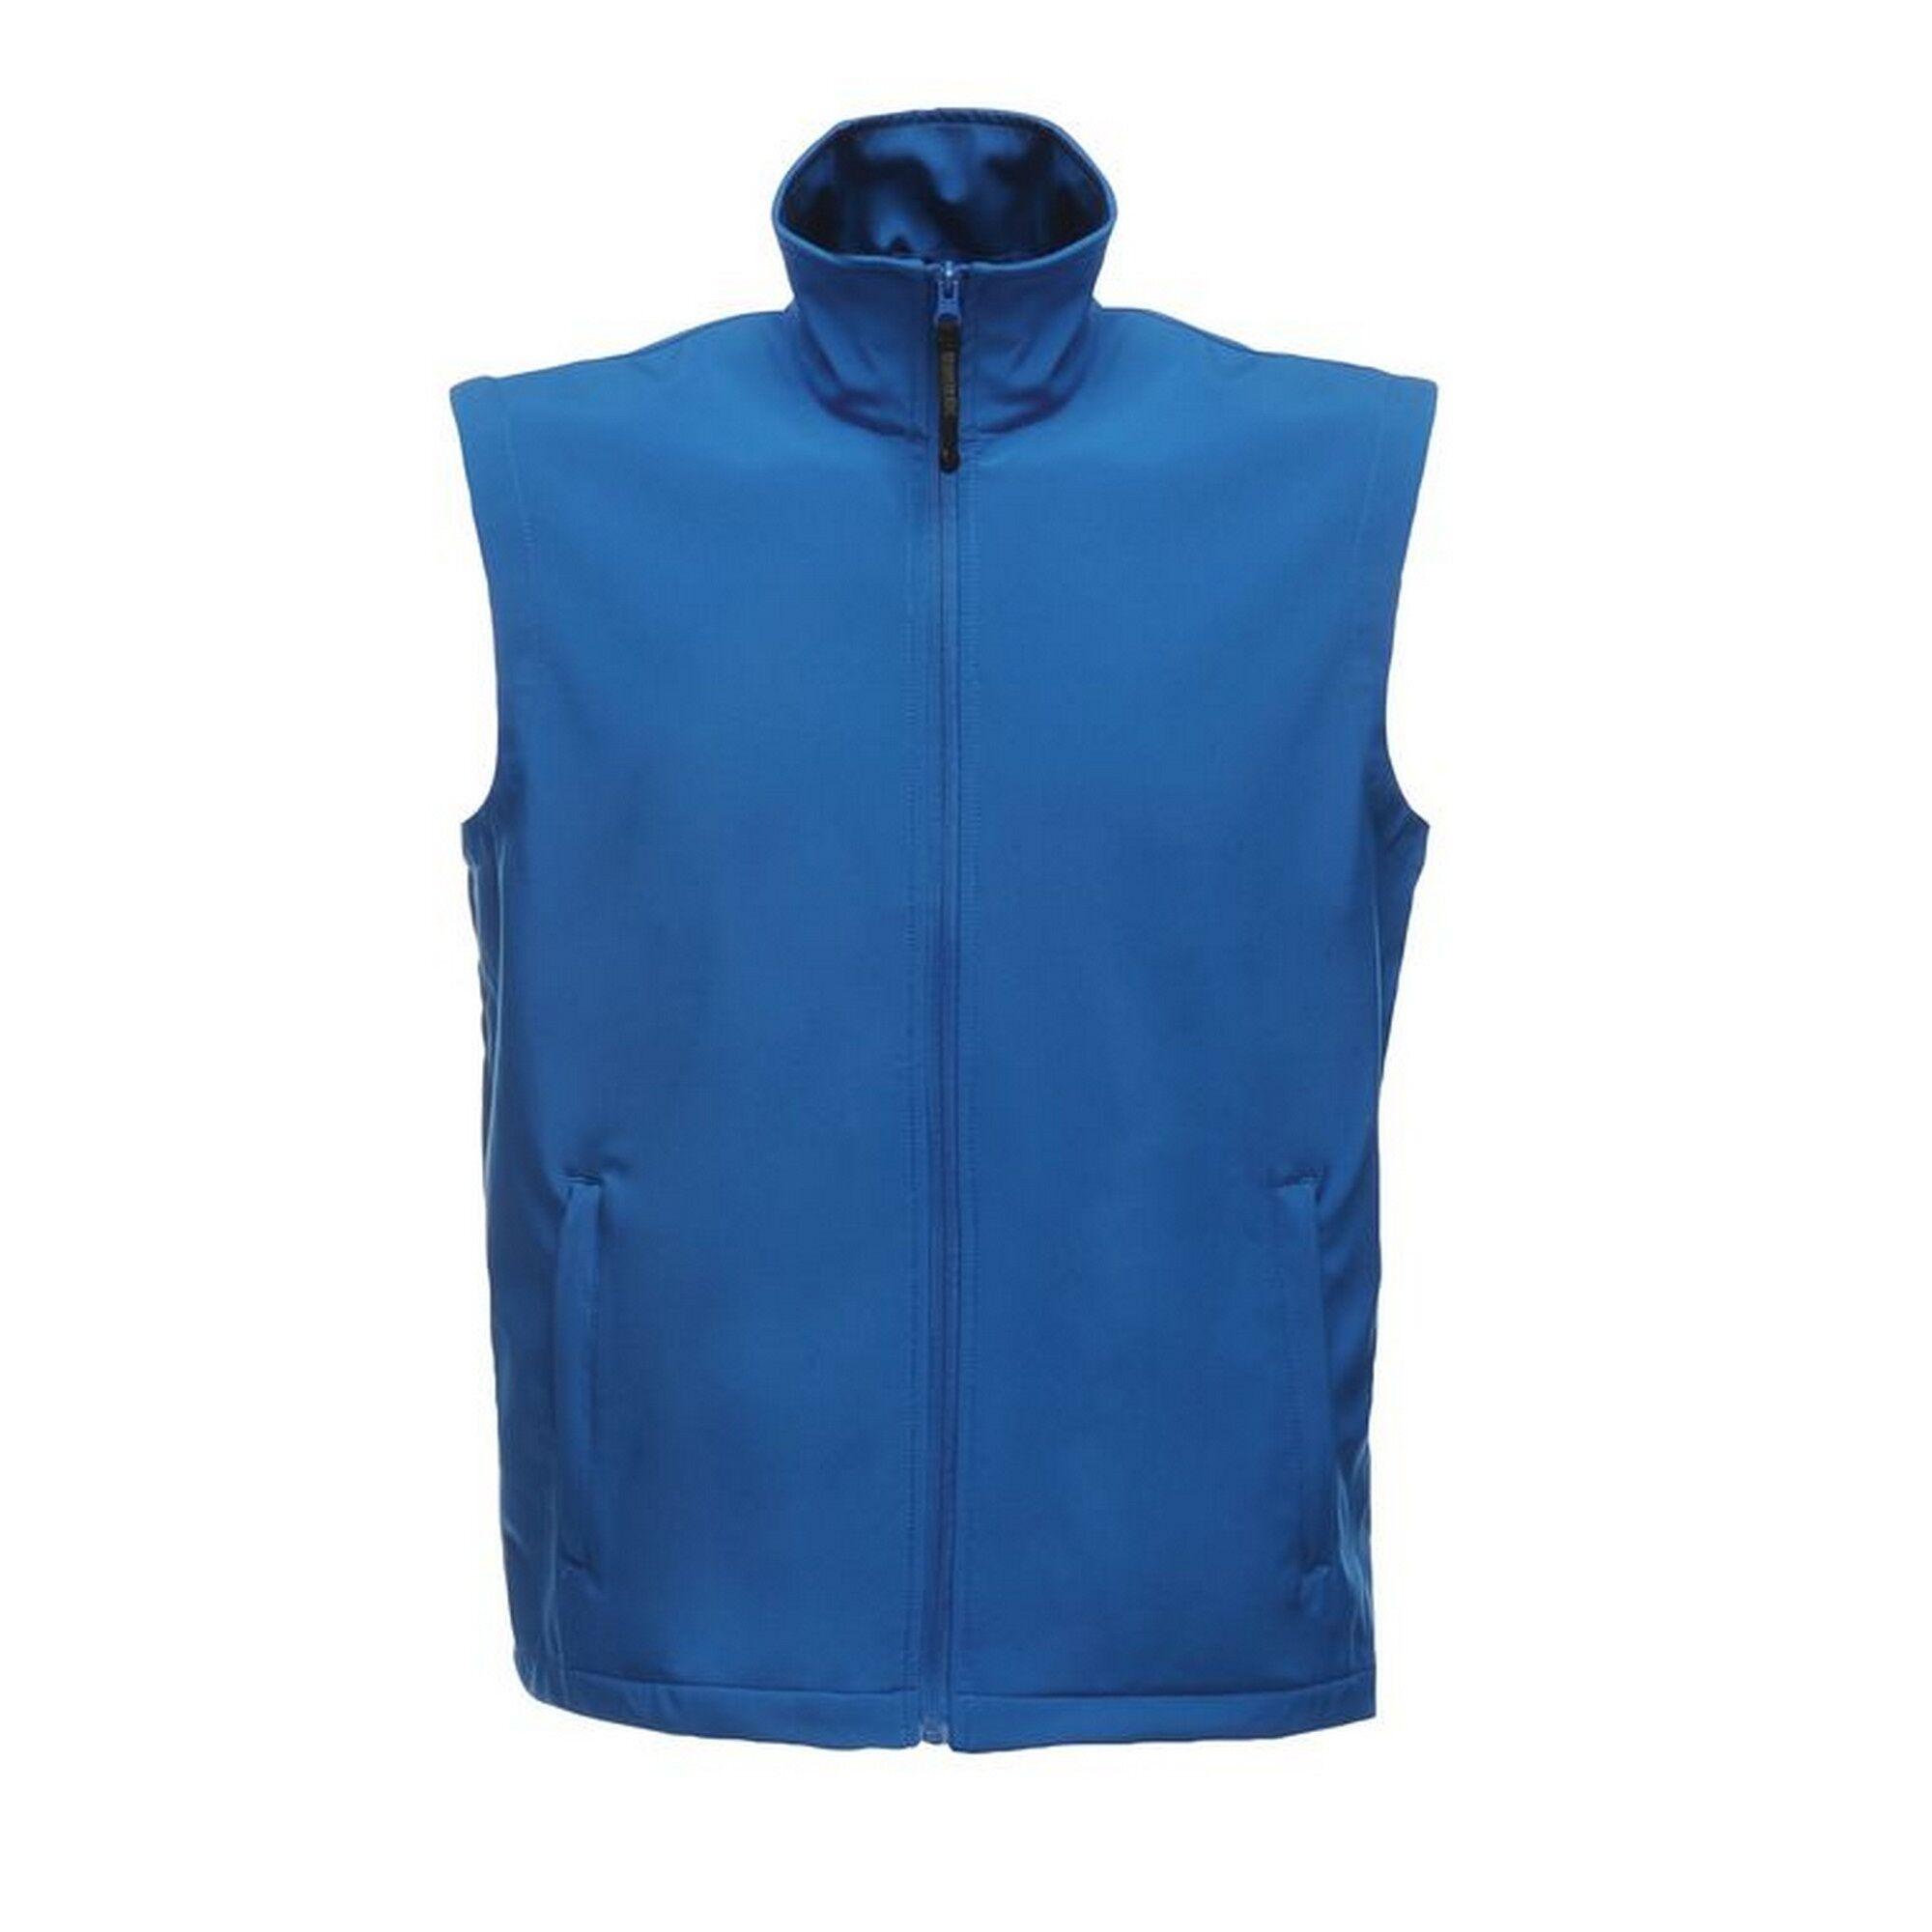 Regatta Professional - Veste Sans Manches En Softshell - Homme (Bleu Oxford) - UTRG2483